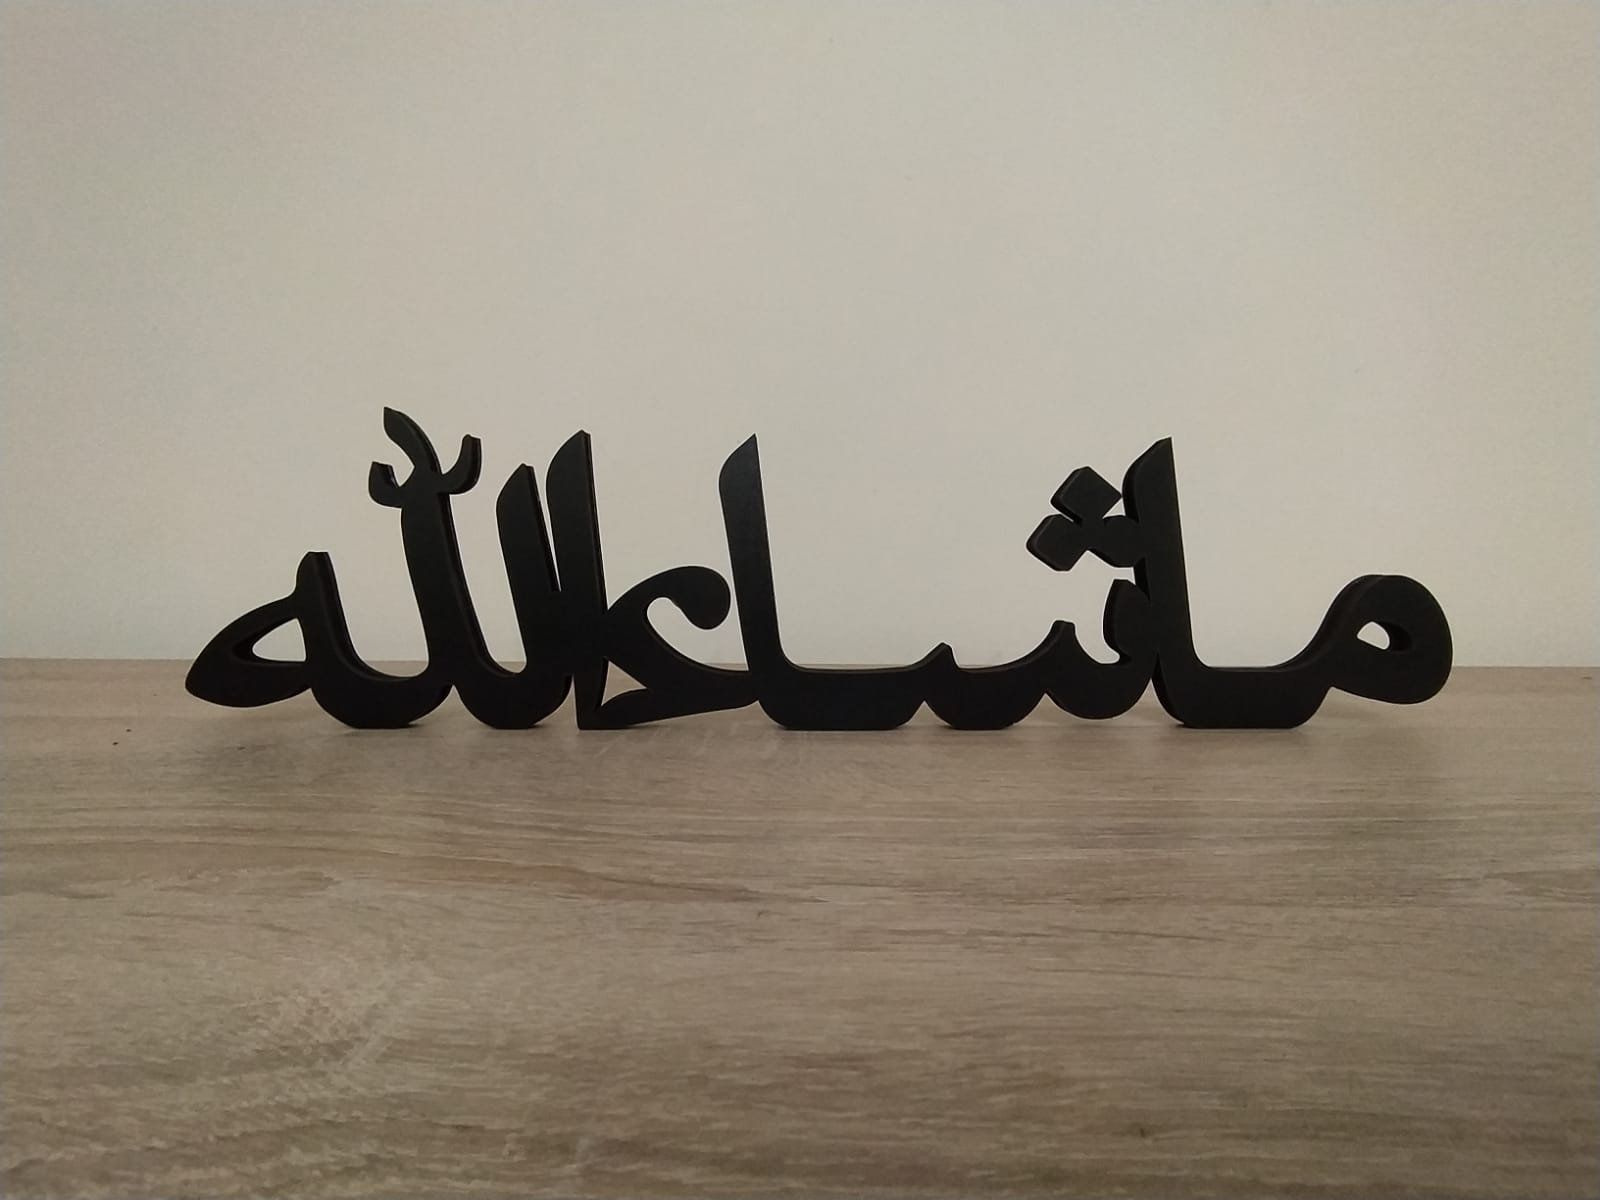 Alhamdulillah Bismillah Mashallah Table Decor Islamic Etsy Islamic Wall Art Islamic Wallpaper Hd Islamic Wall Decor